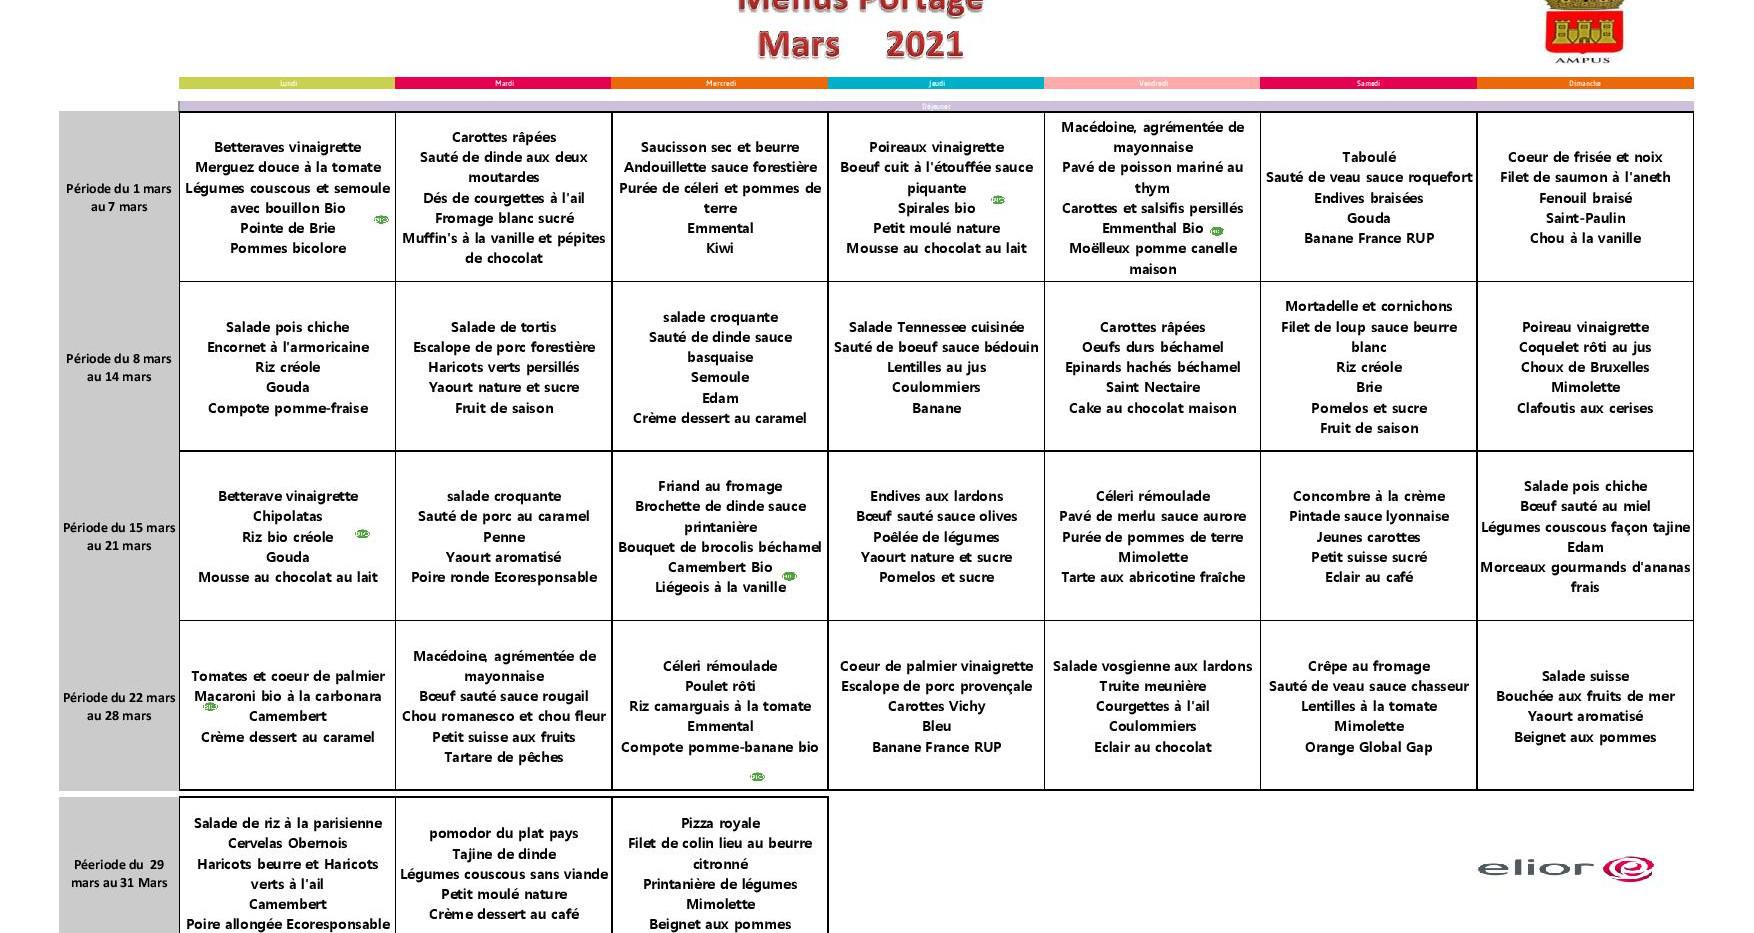 mars 2021 PORTAGE ampus.jpg